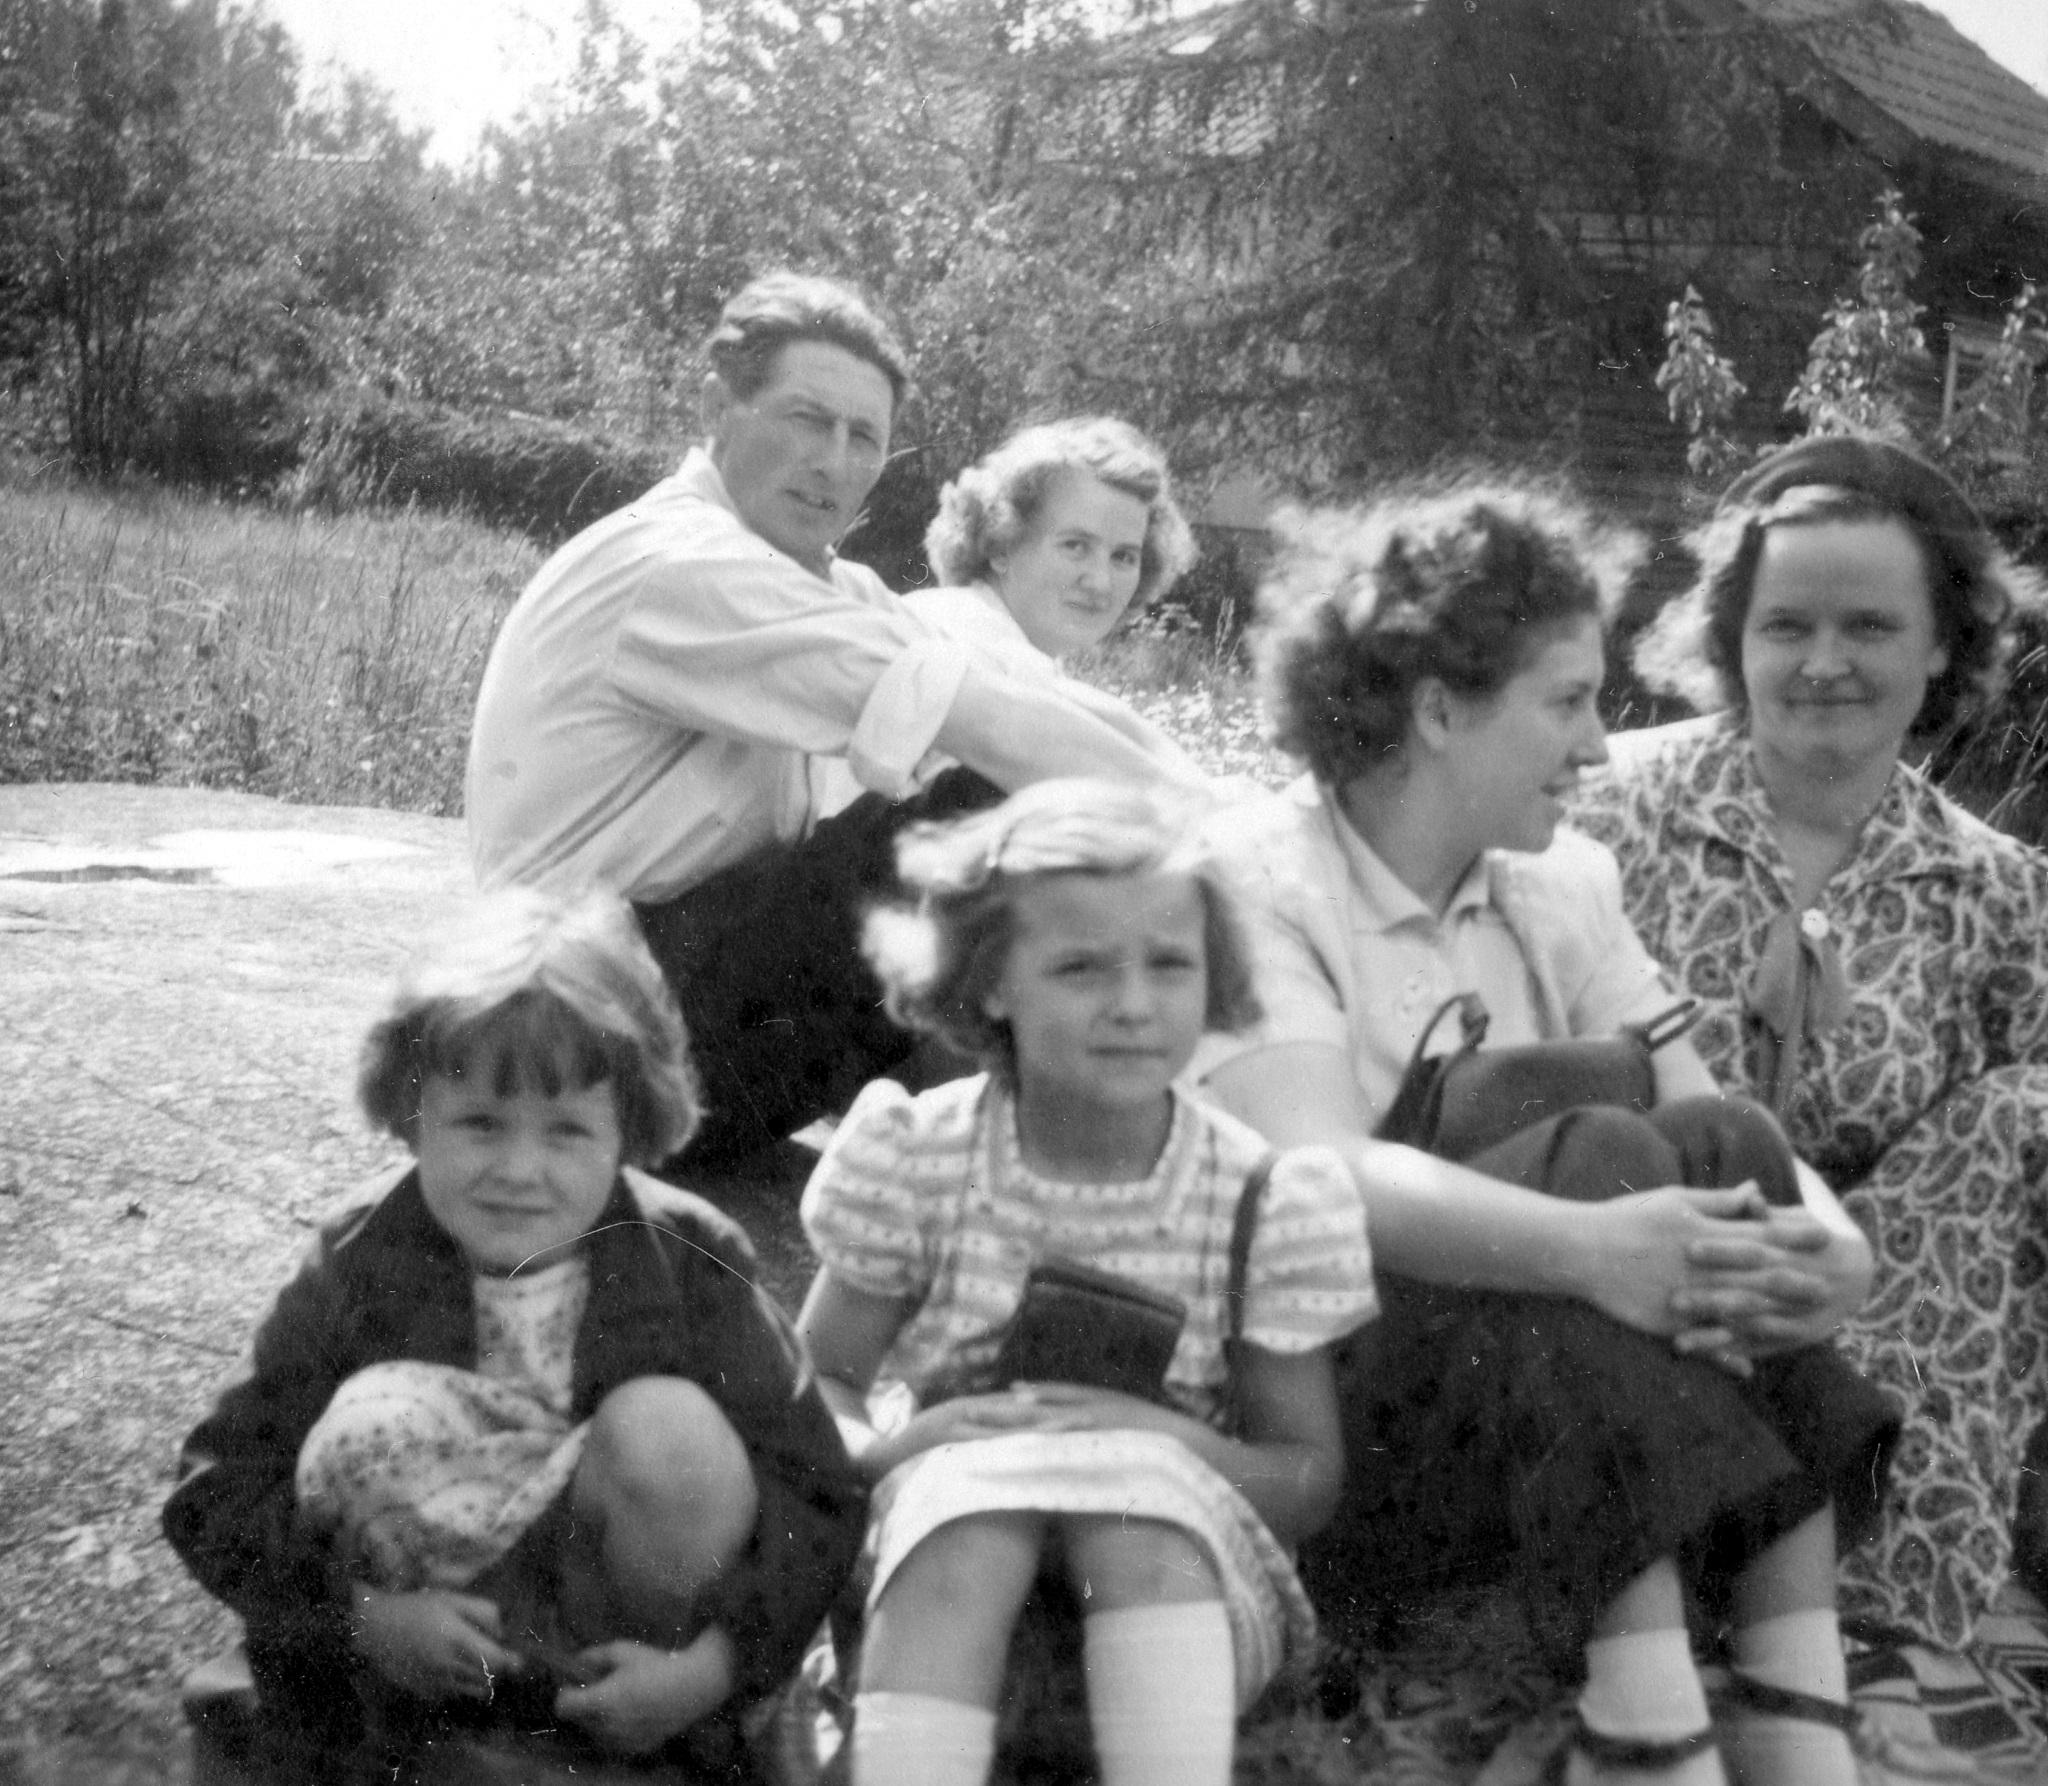 Midsommar 1950